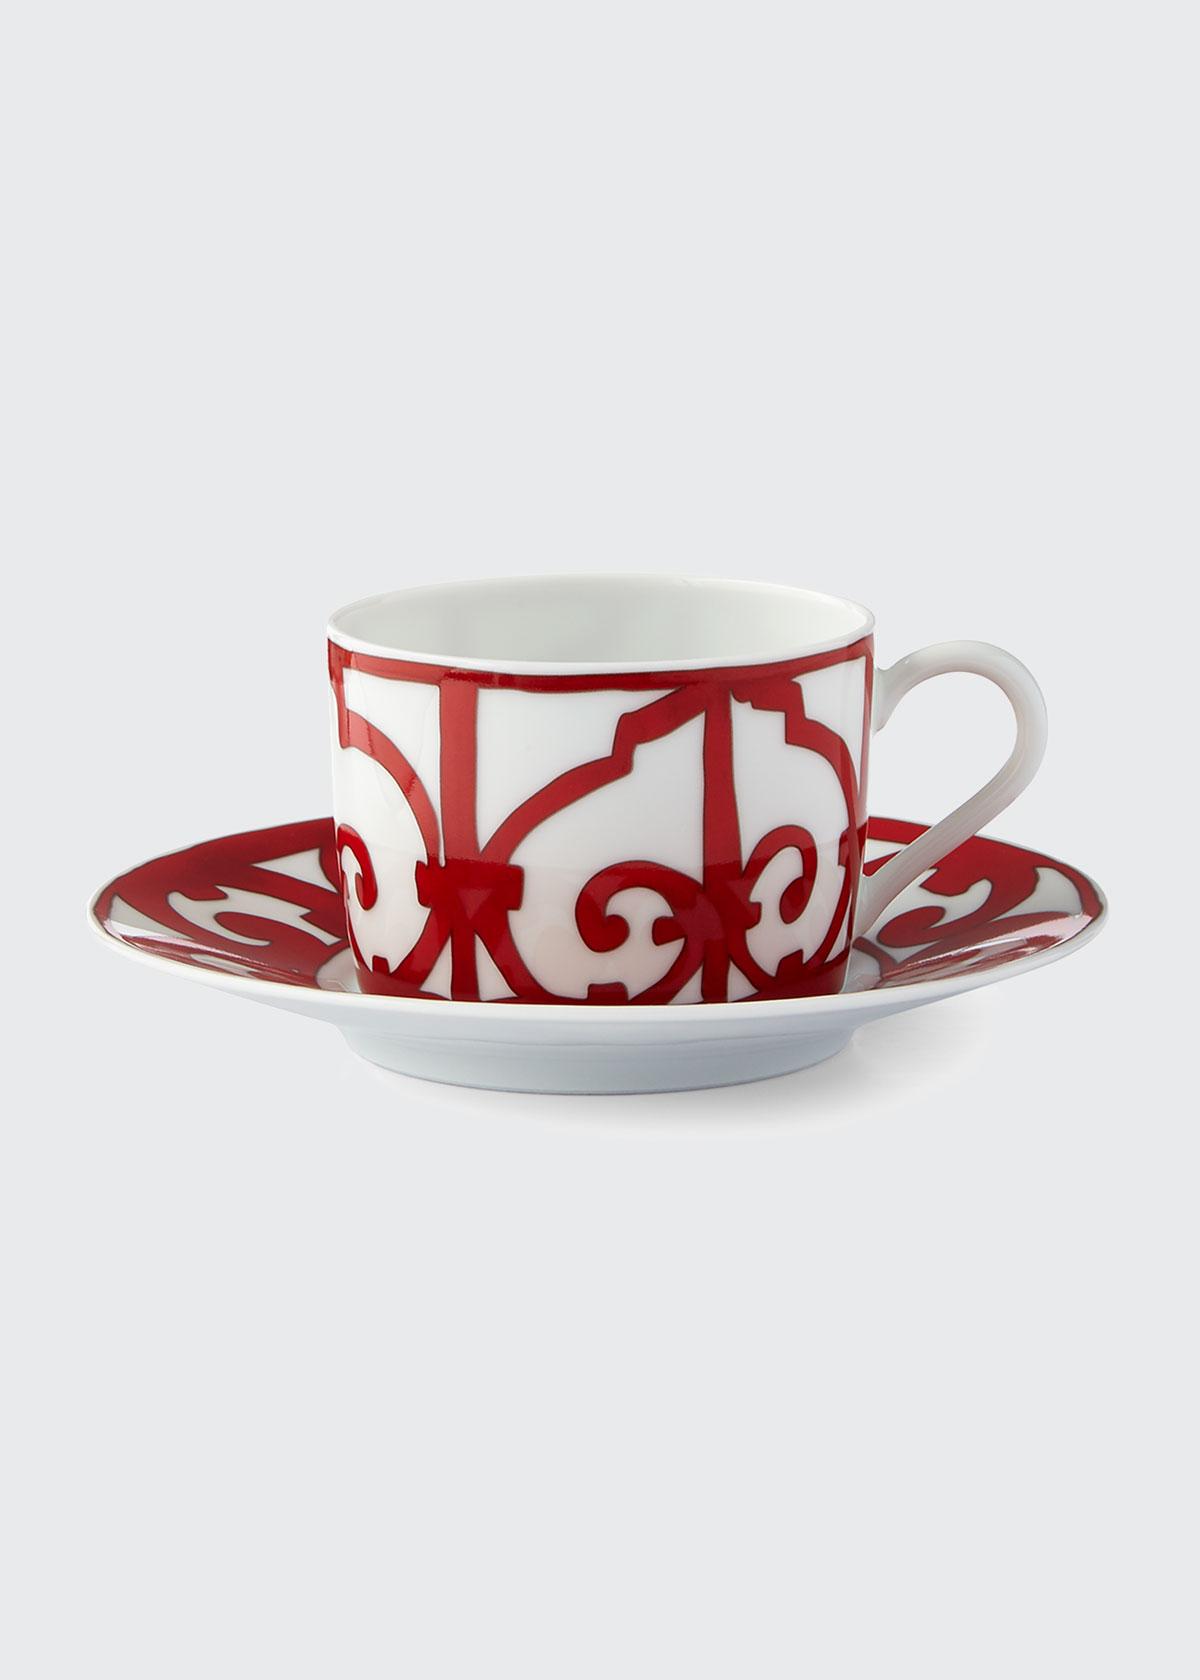 Herm S Drinkwares BALCON DU GUADALQUIVIR TEA CUP & SAUCER